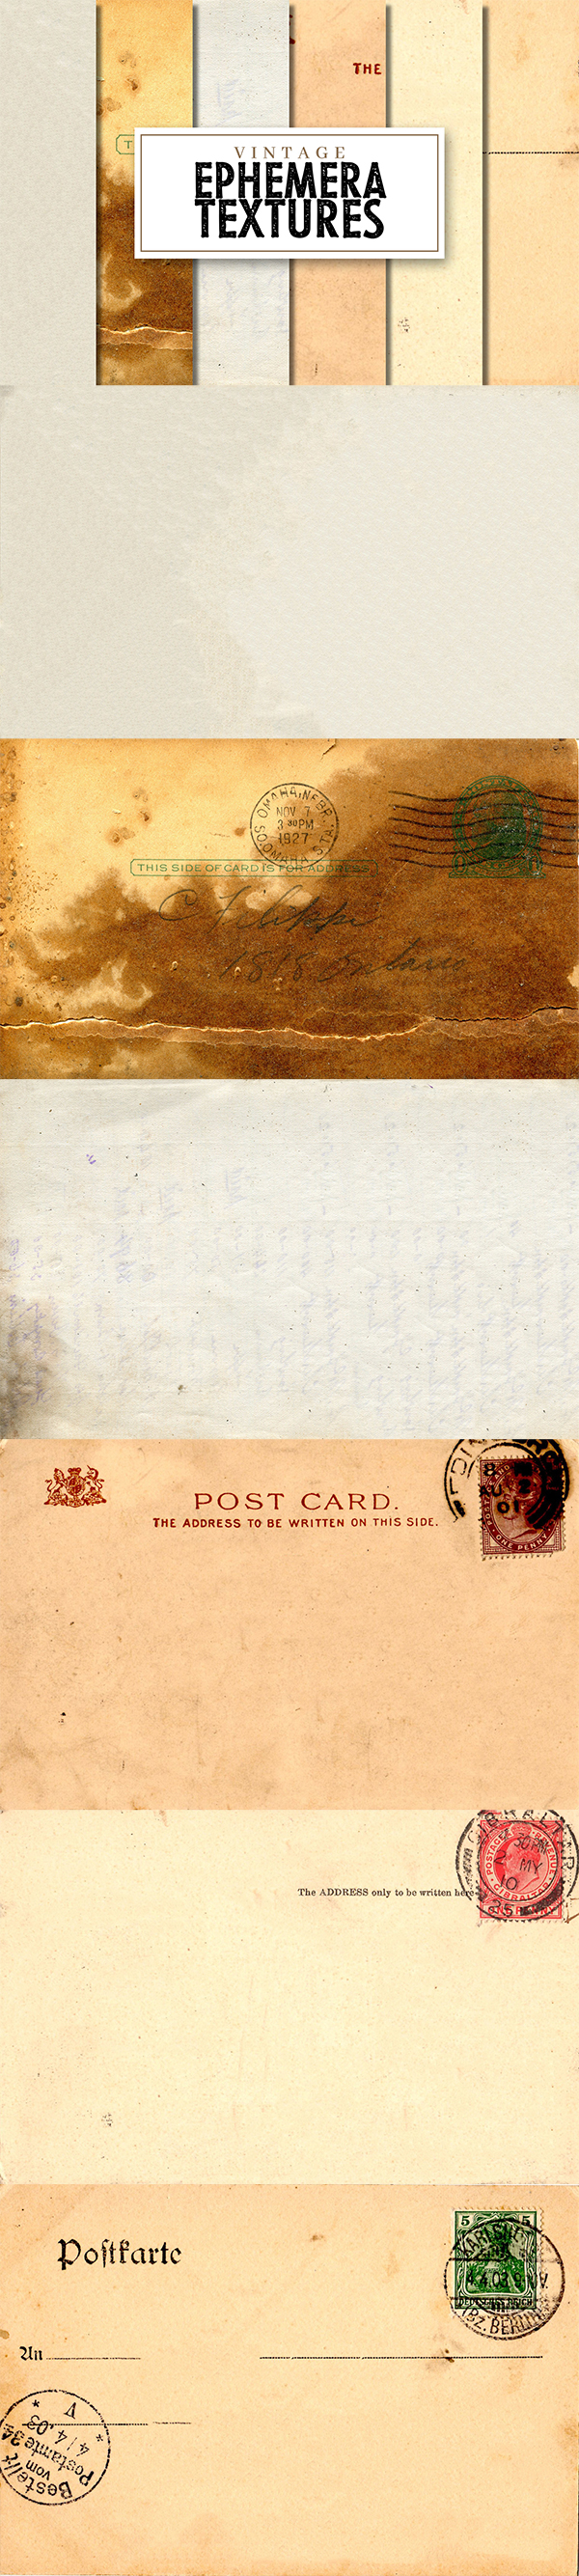 Free Vintage Ephemera and Paper Textures